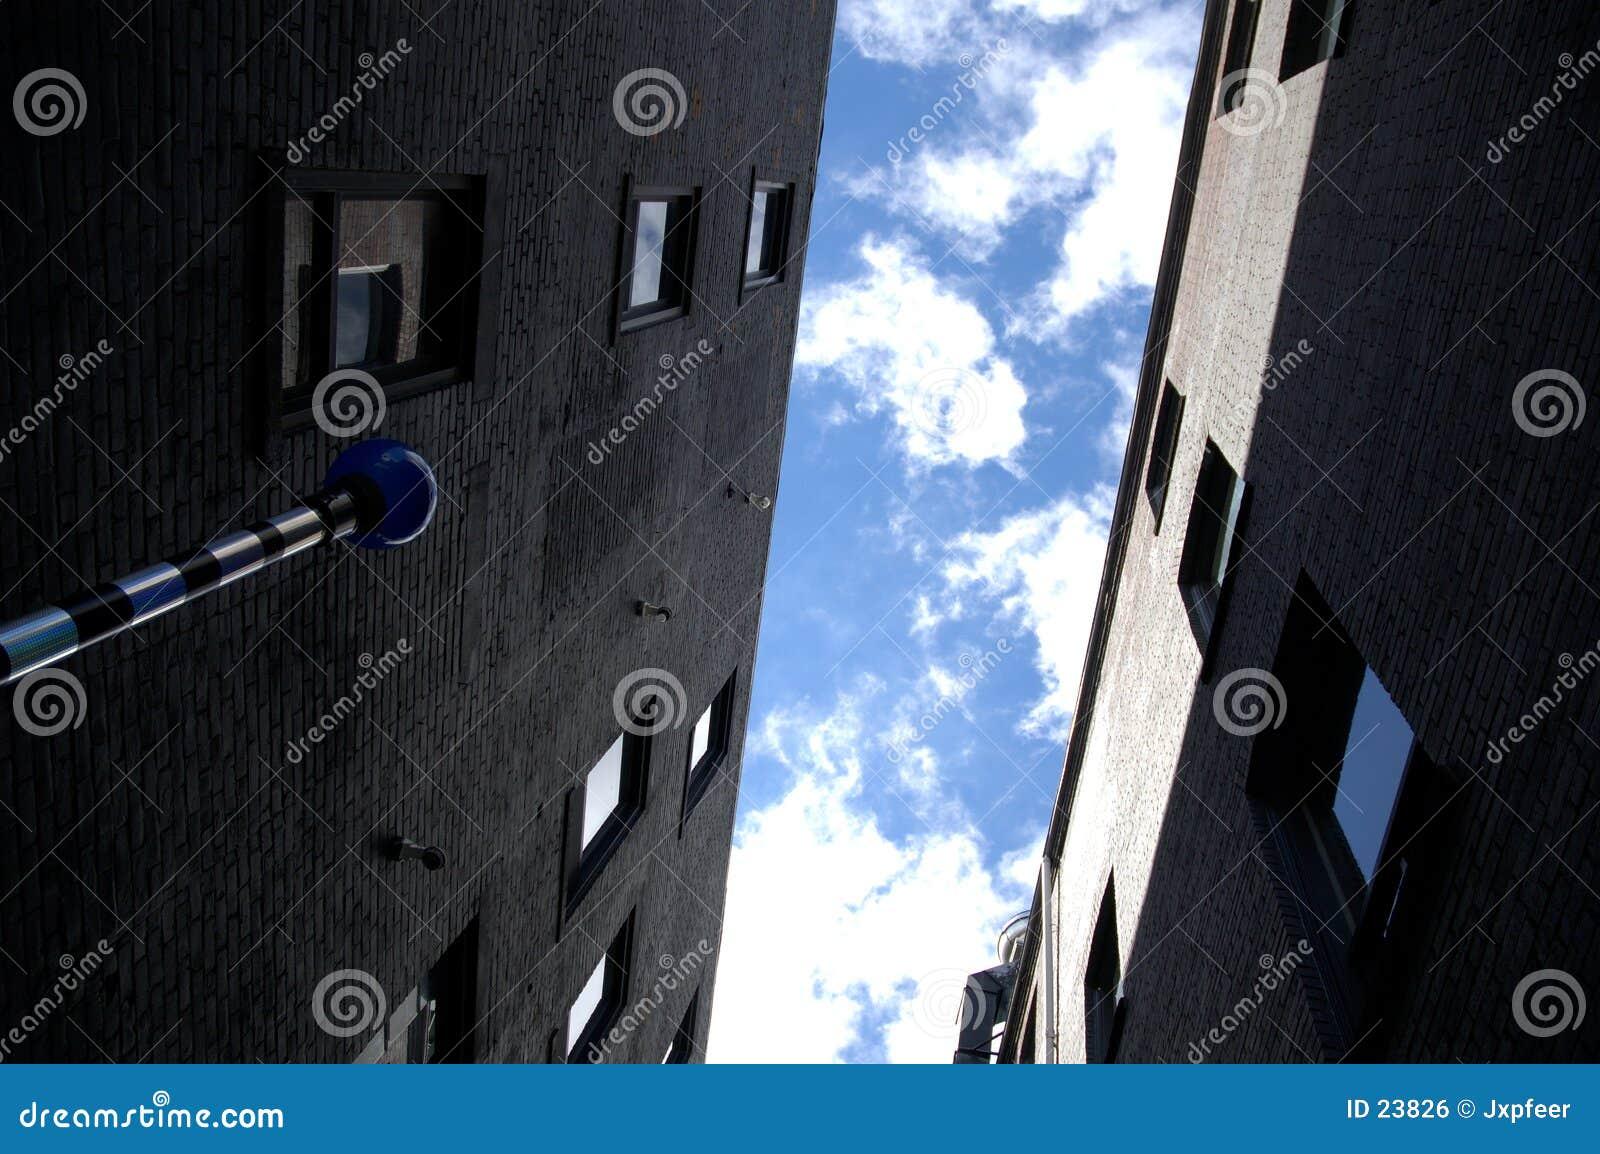 Apartment buidings